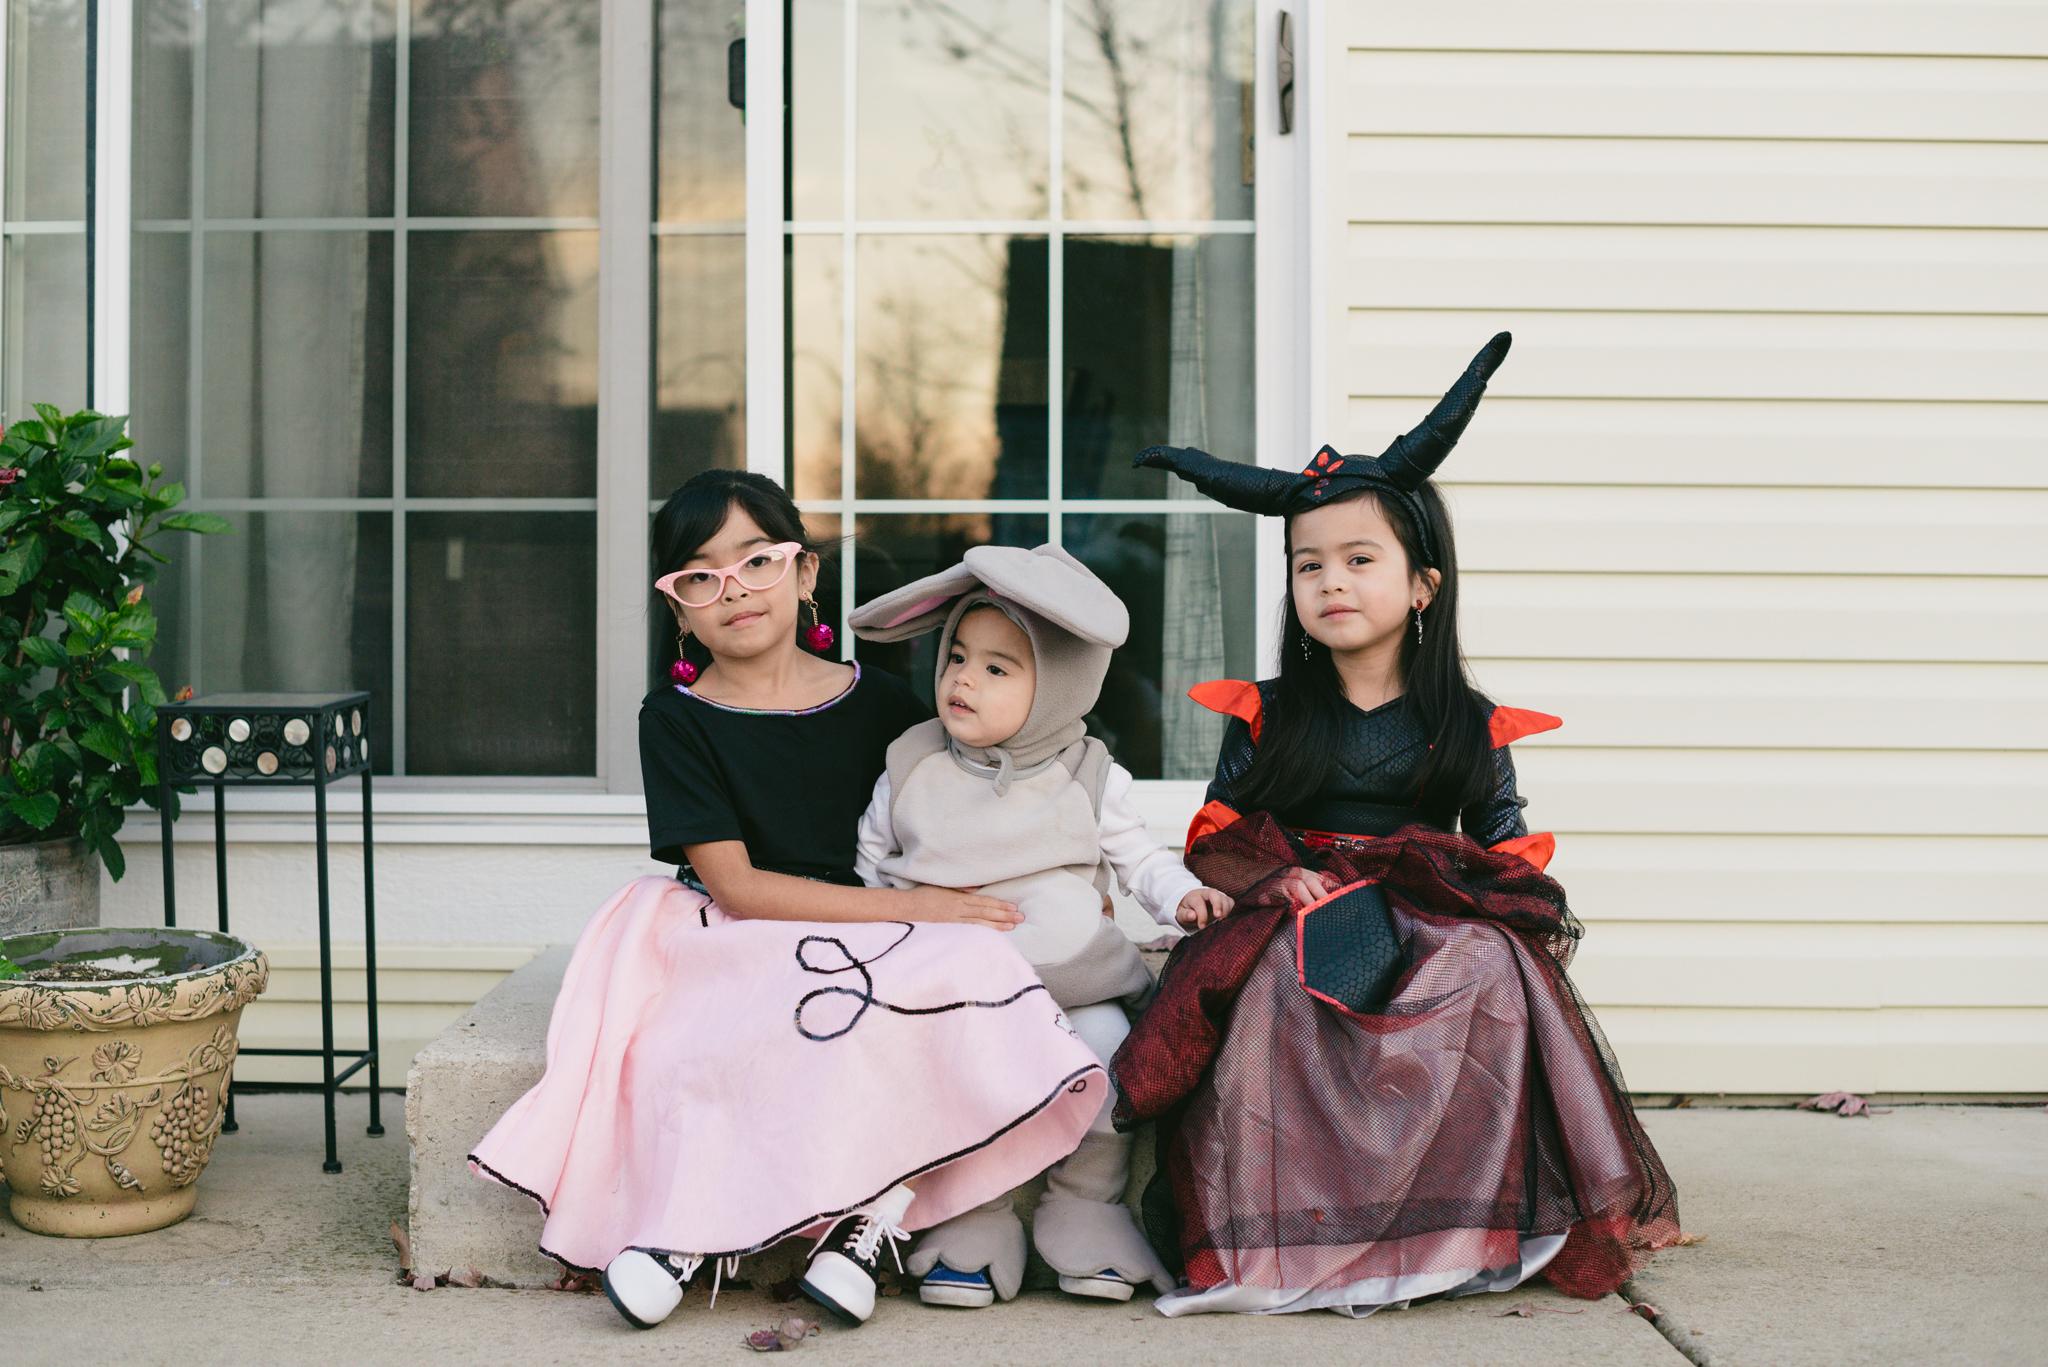 20141026-Halloween 2014-066-FBEdit.JPG